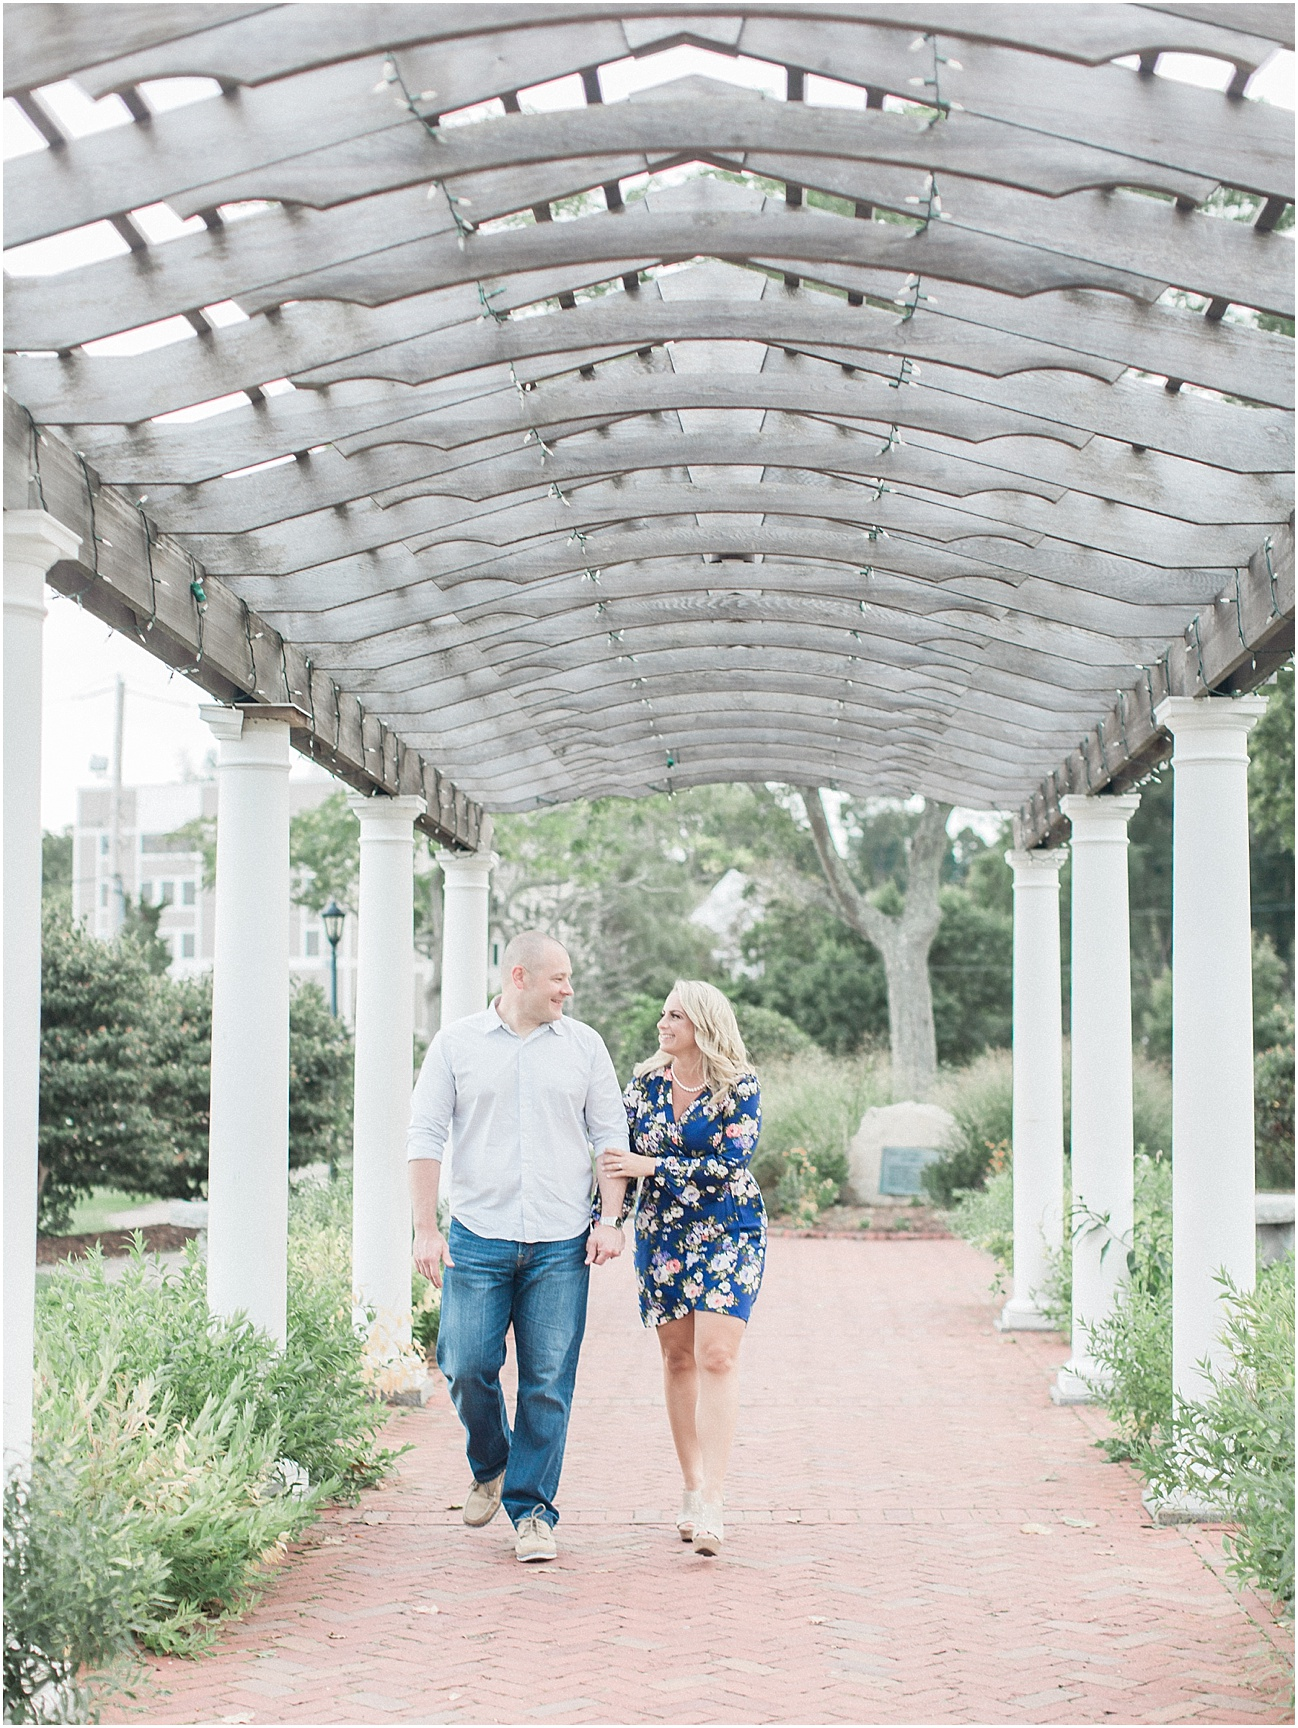 amy_erik_plymouth_brewster_gardens_jetty_champagne_cape_cod_boston_wedding_photographer_meredith_jane_photography_photo_0757.jpg